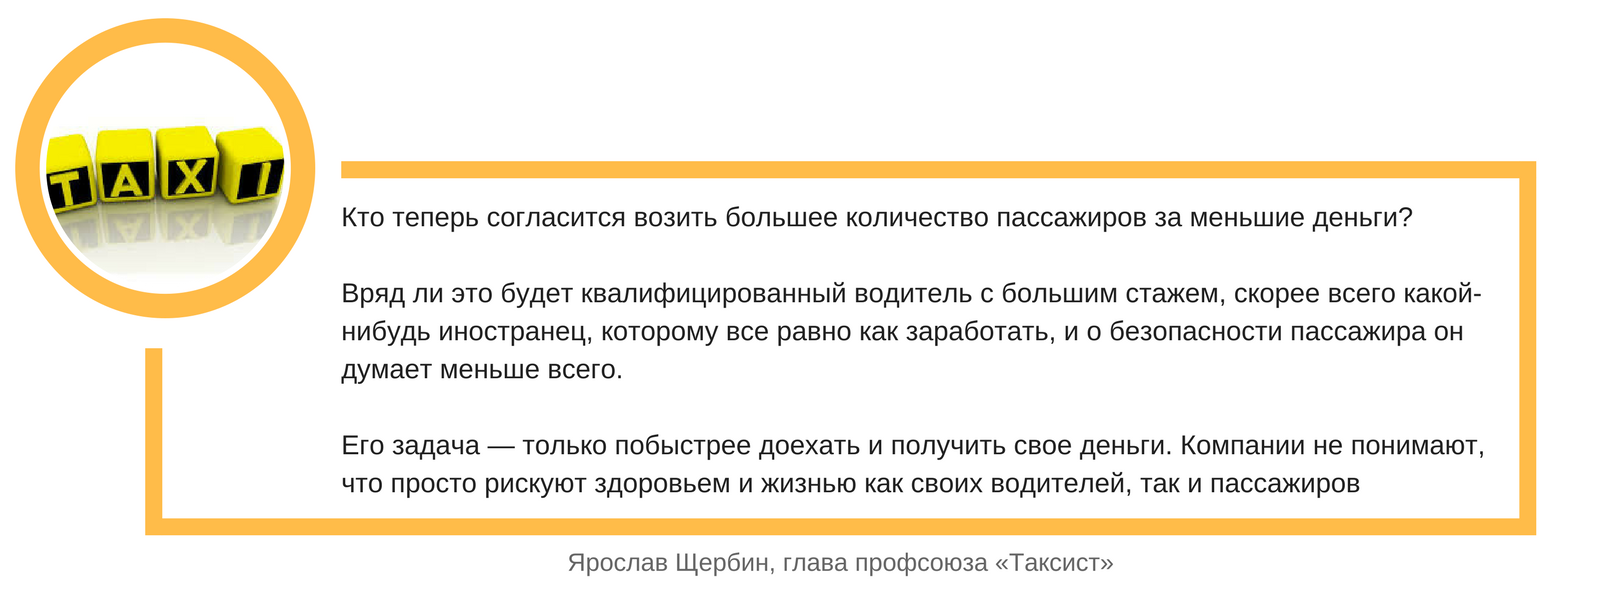 Ярослав Щербин про такси